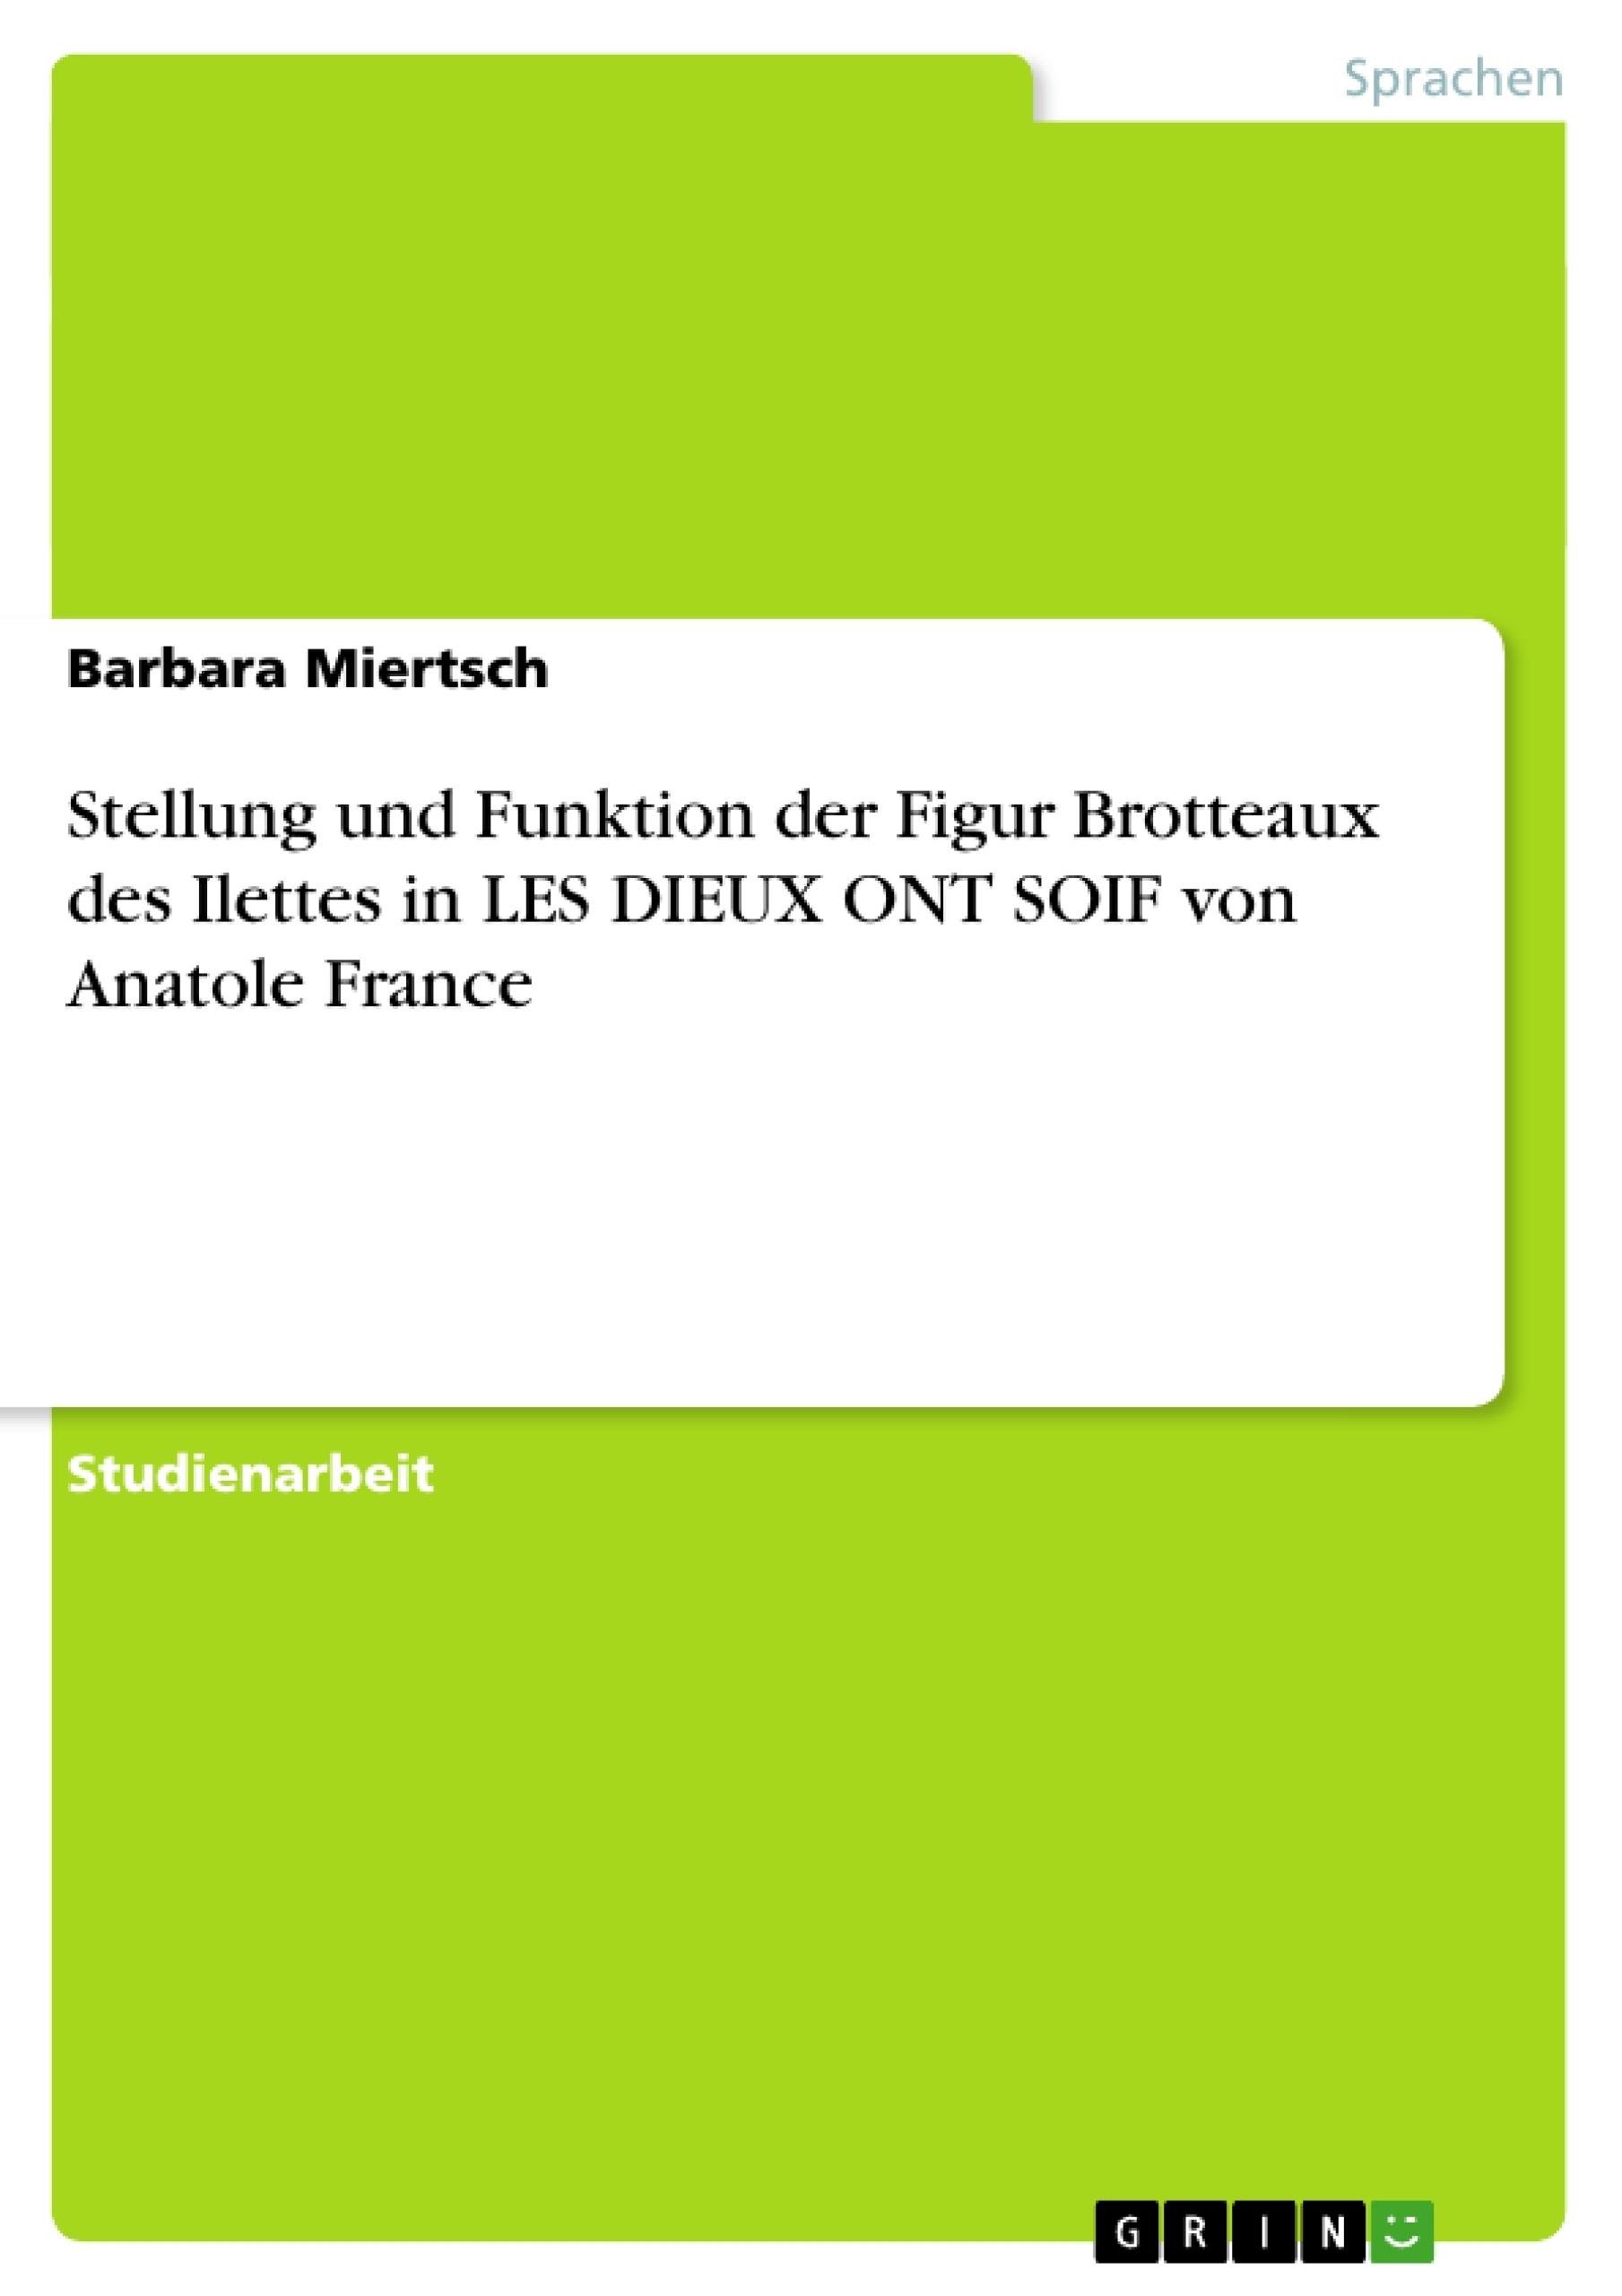 Titel: Stellung und Funktion der Figur Brotteaux des Ilettes  in LES DIEUX ONT SOIF von Anatole France